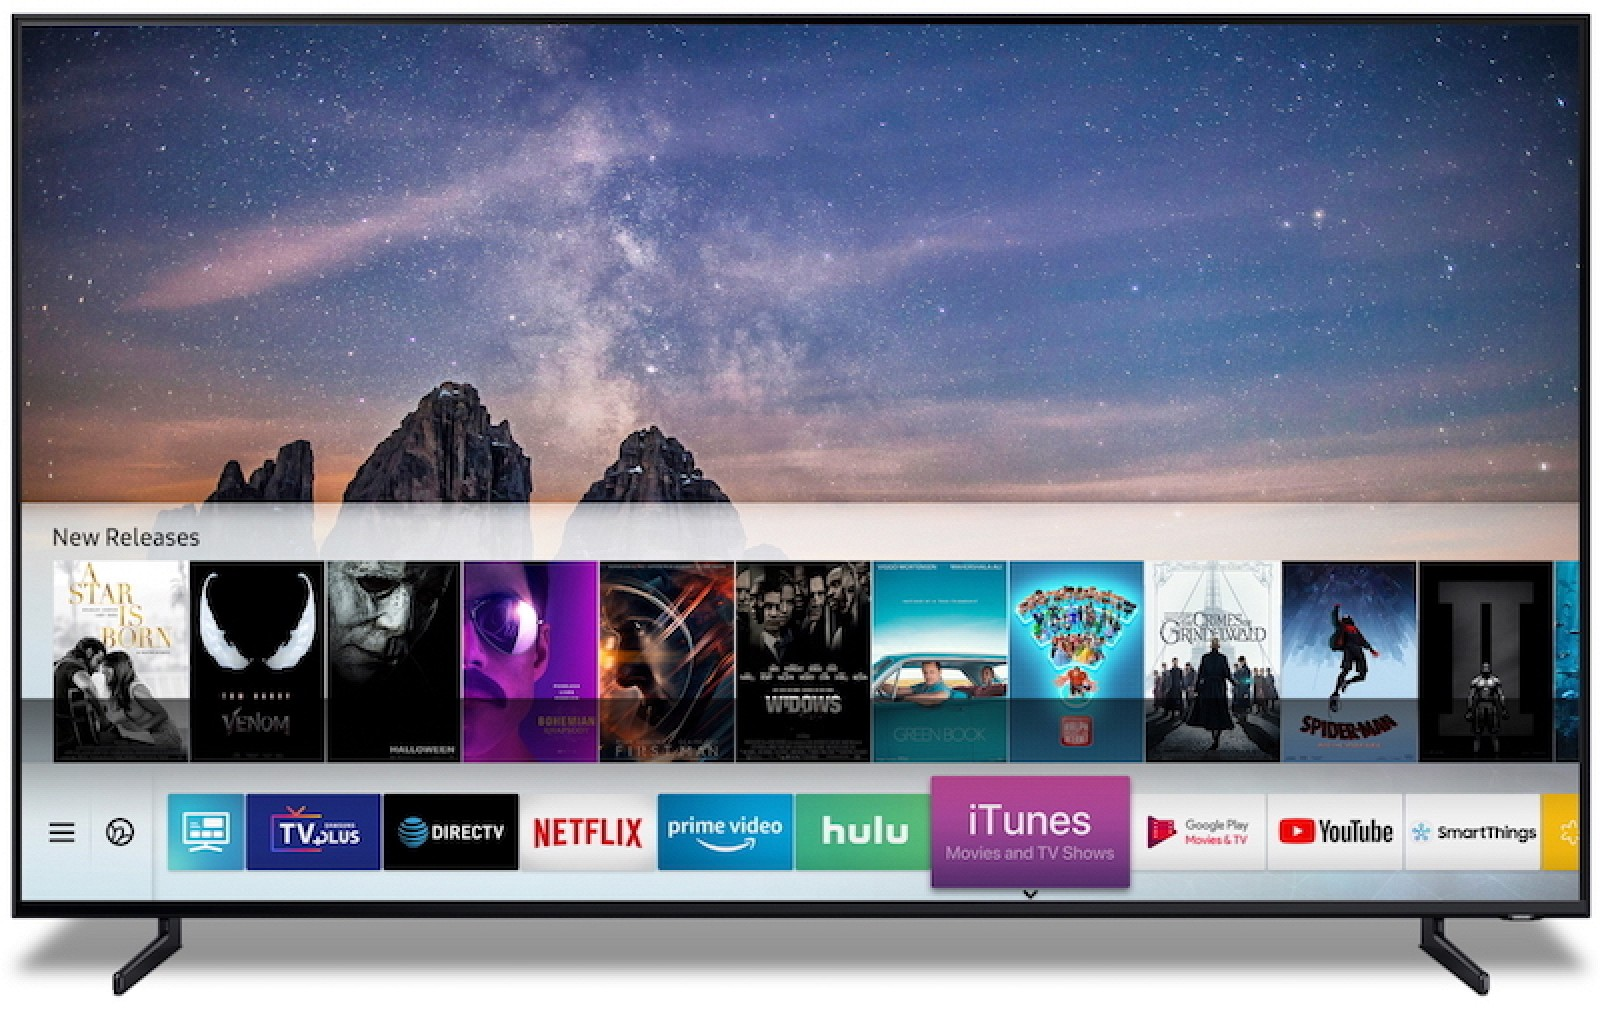 AirPlay 2 iTunes Apple Siri Samsung Smart TV telewizory CES 2019 iOS 12.2 co nowego